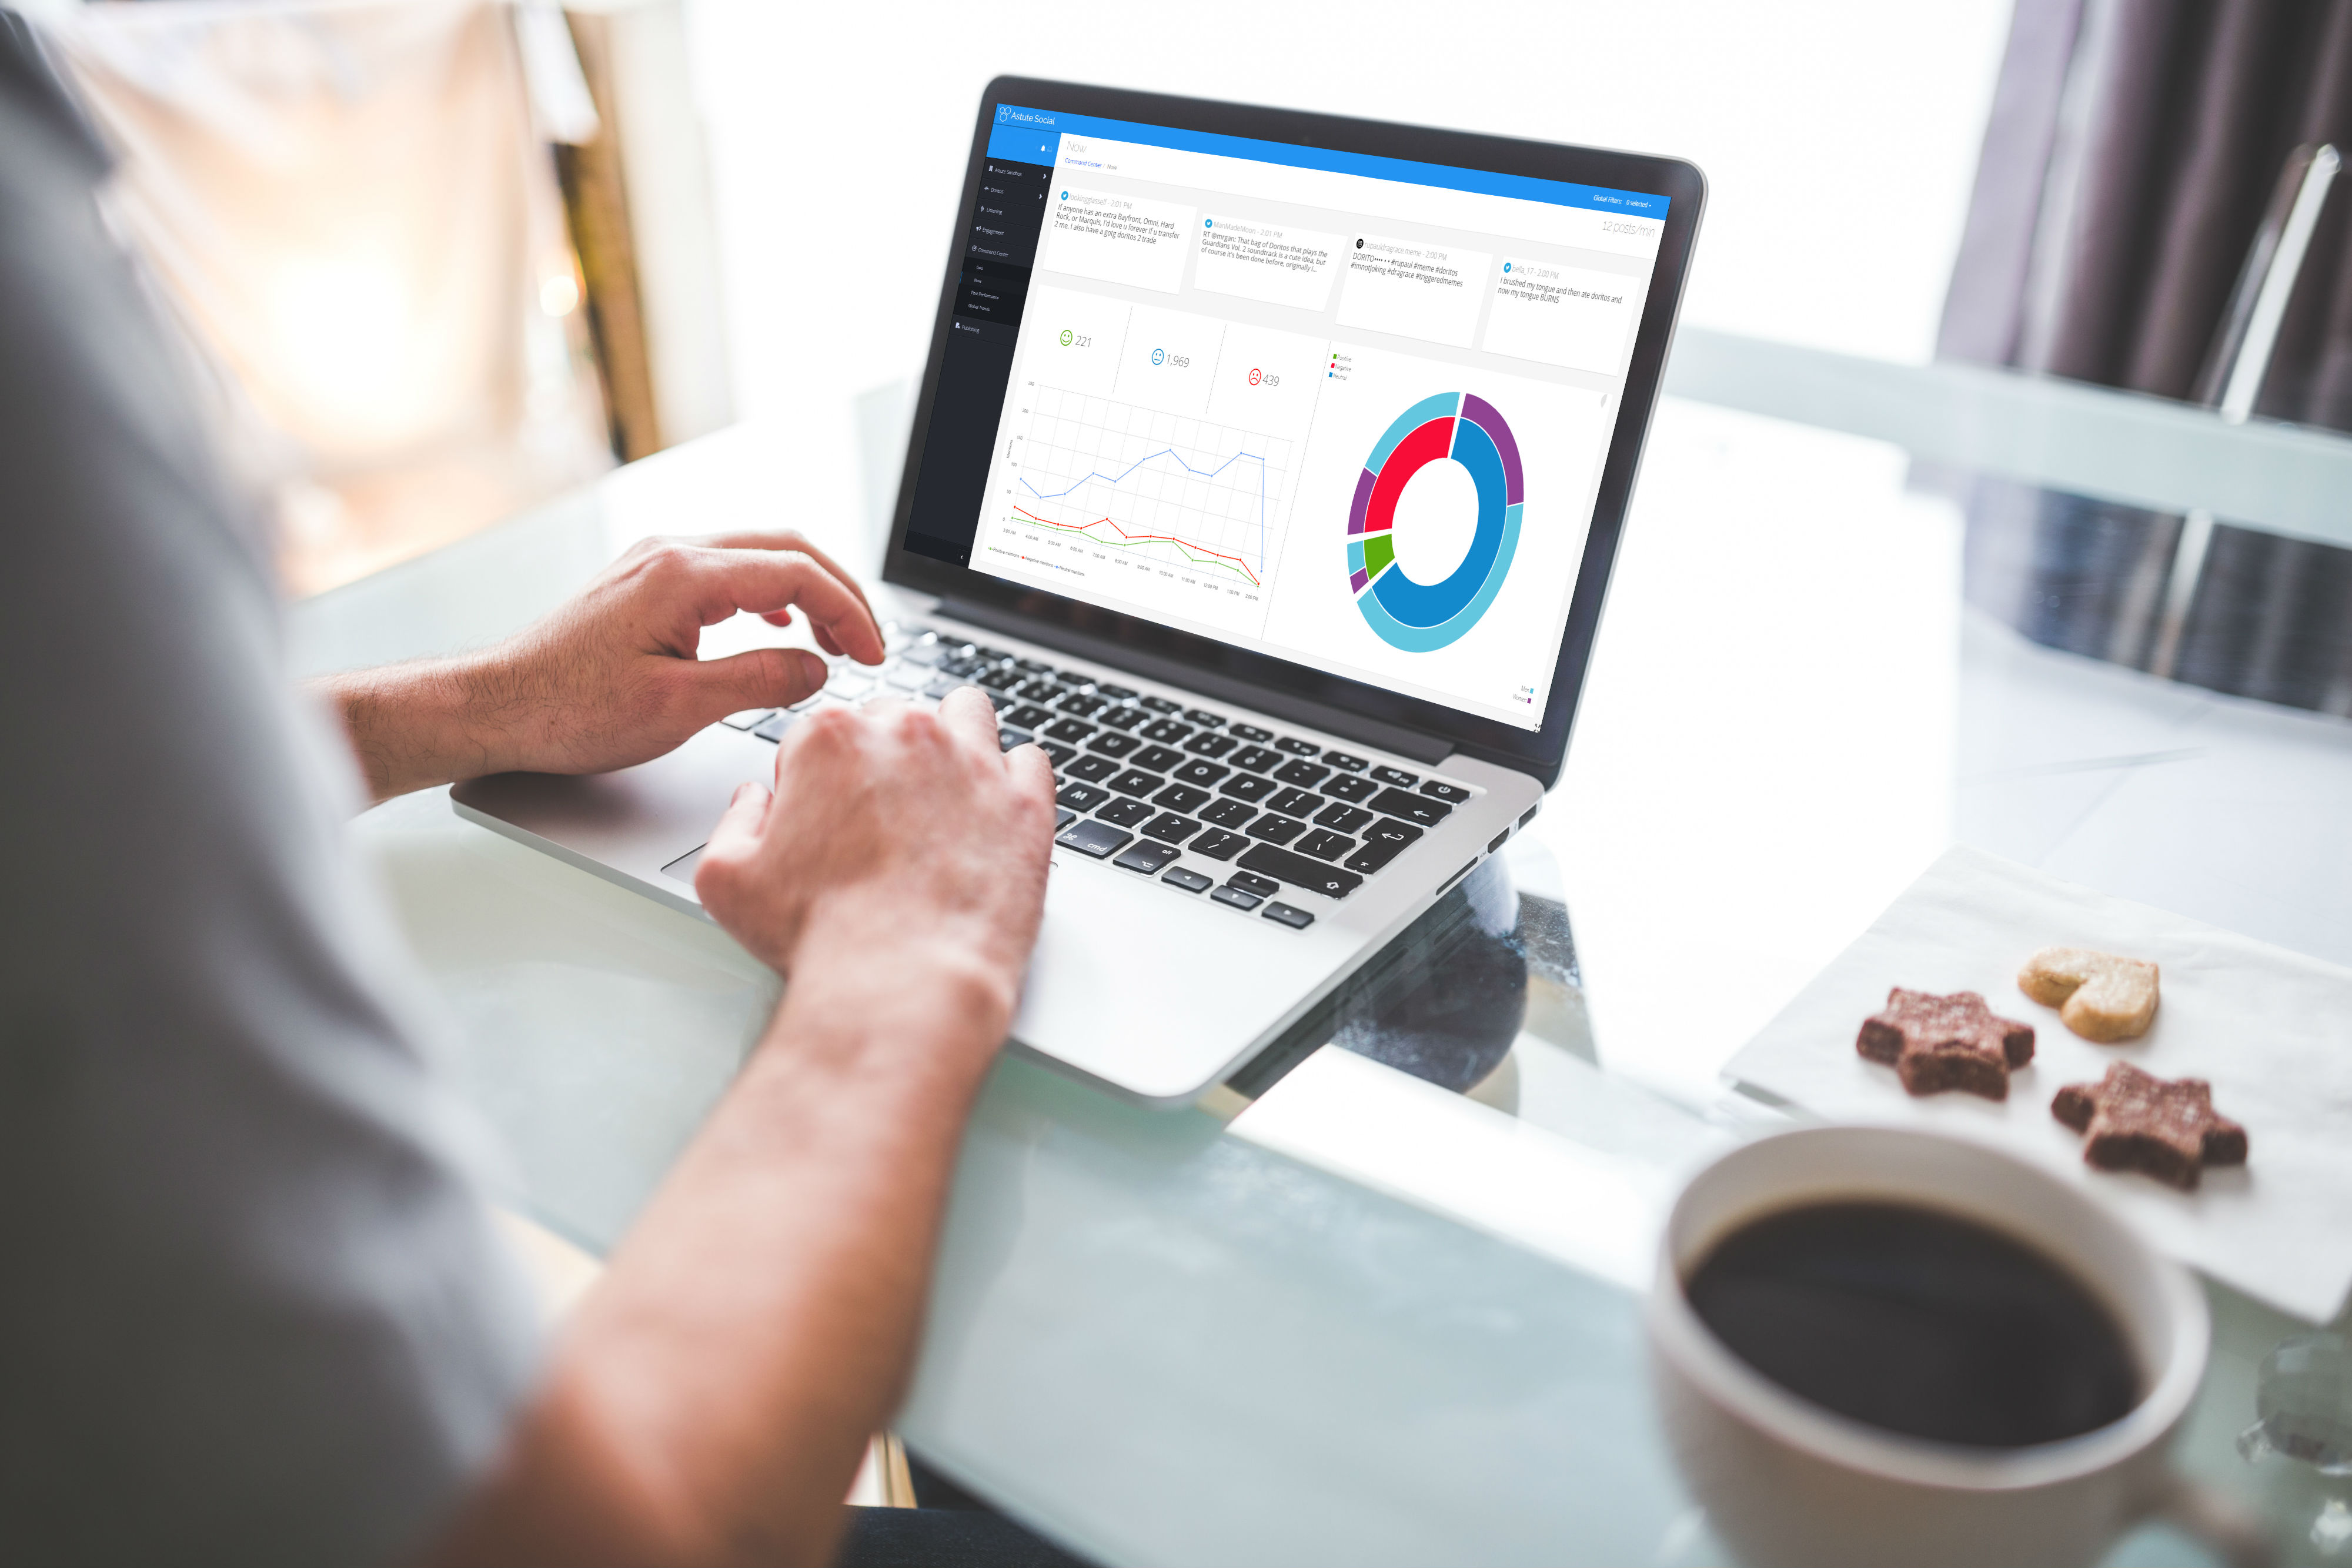 New social media capabilities provide up to the minute cross-platform analytics